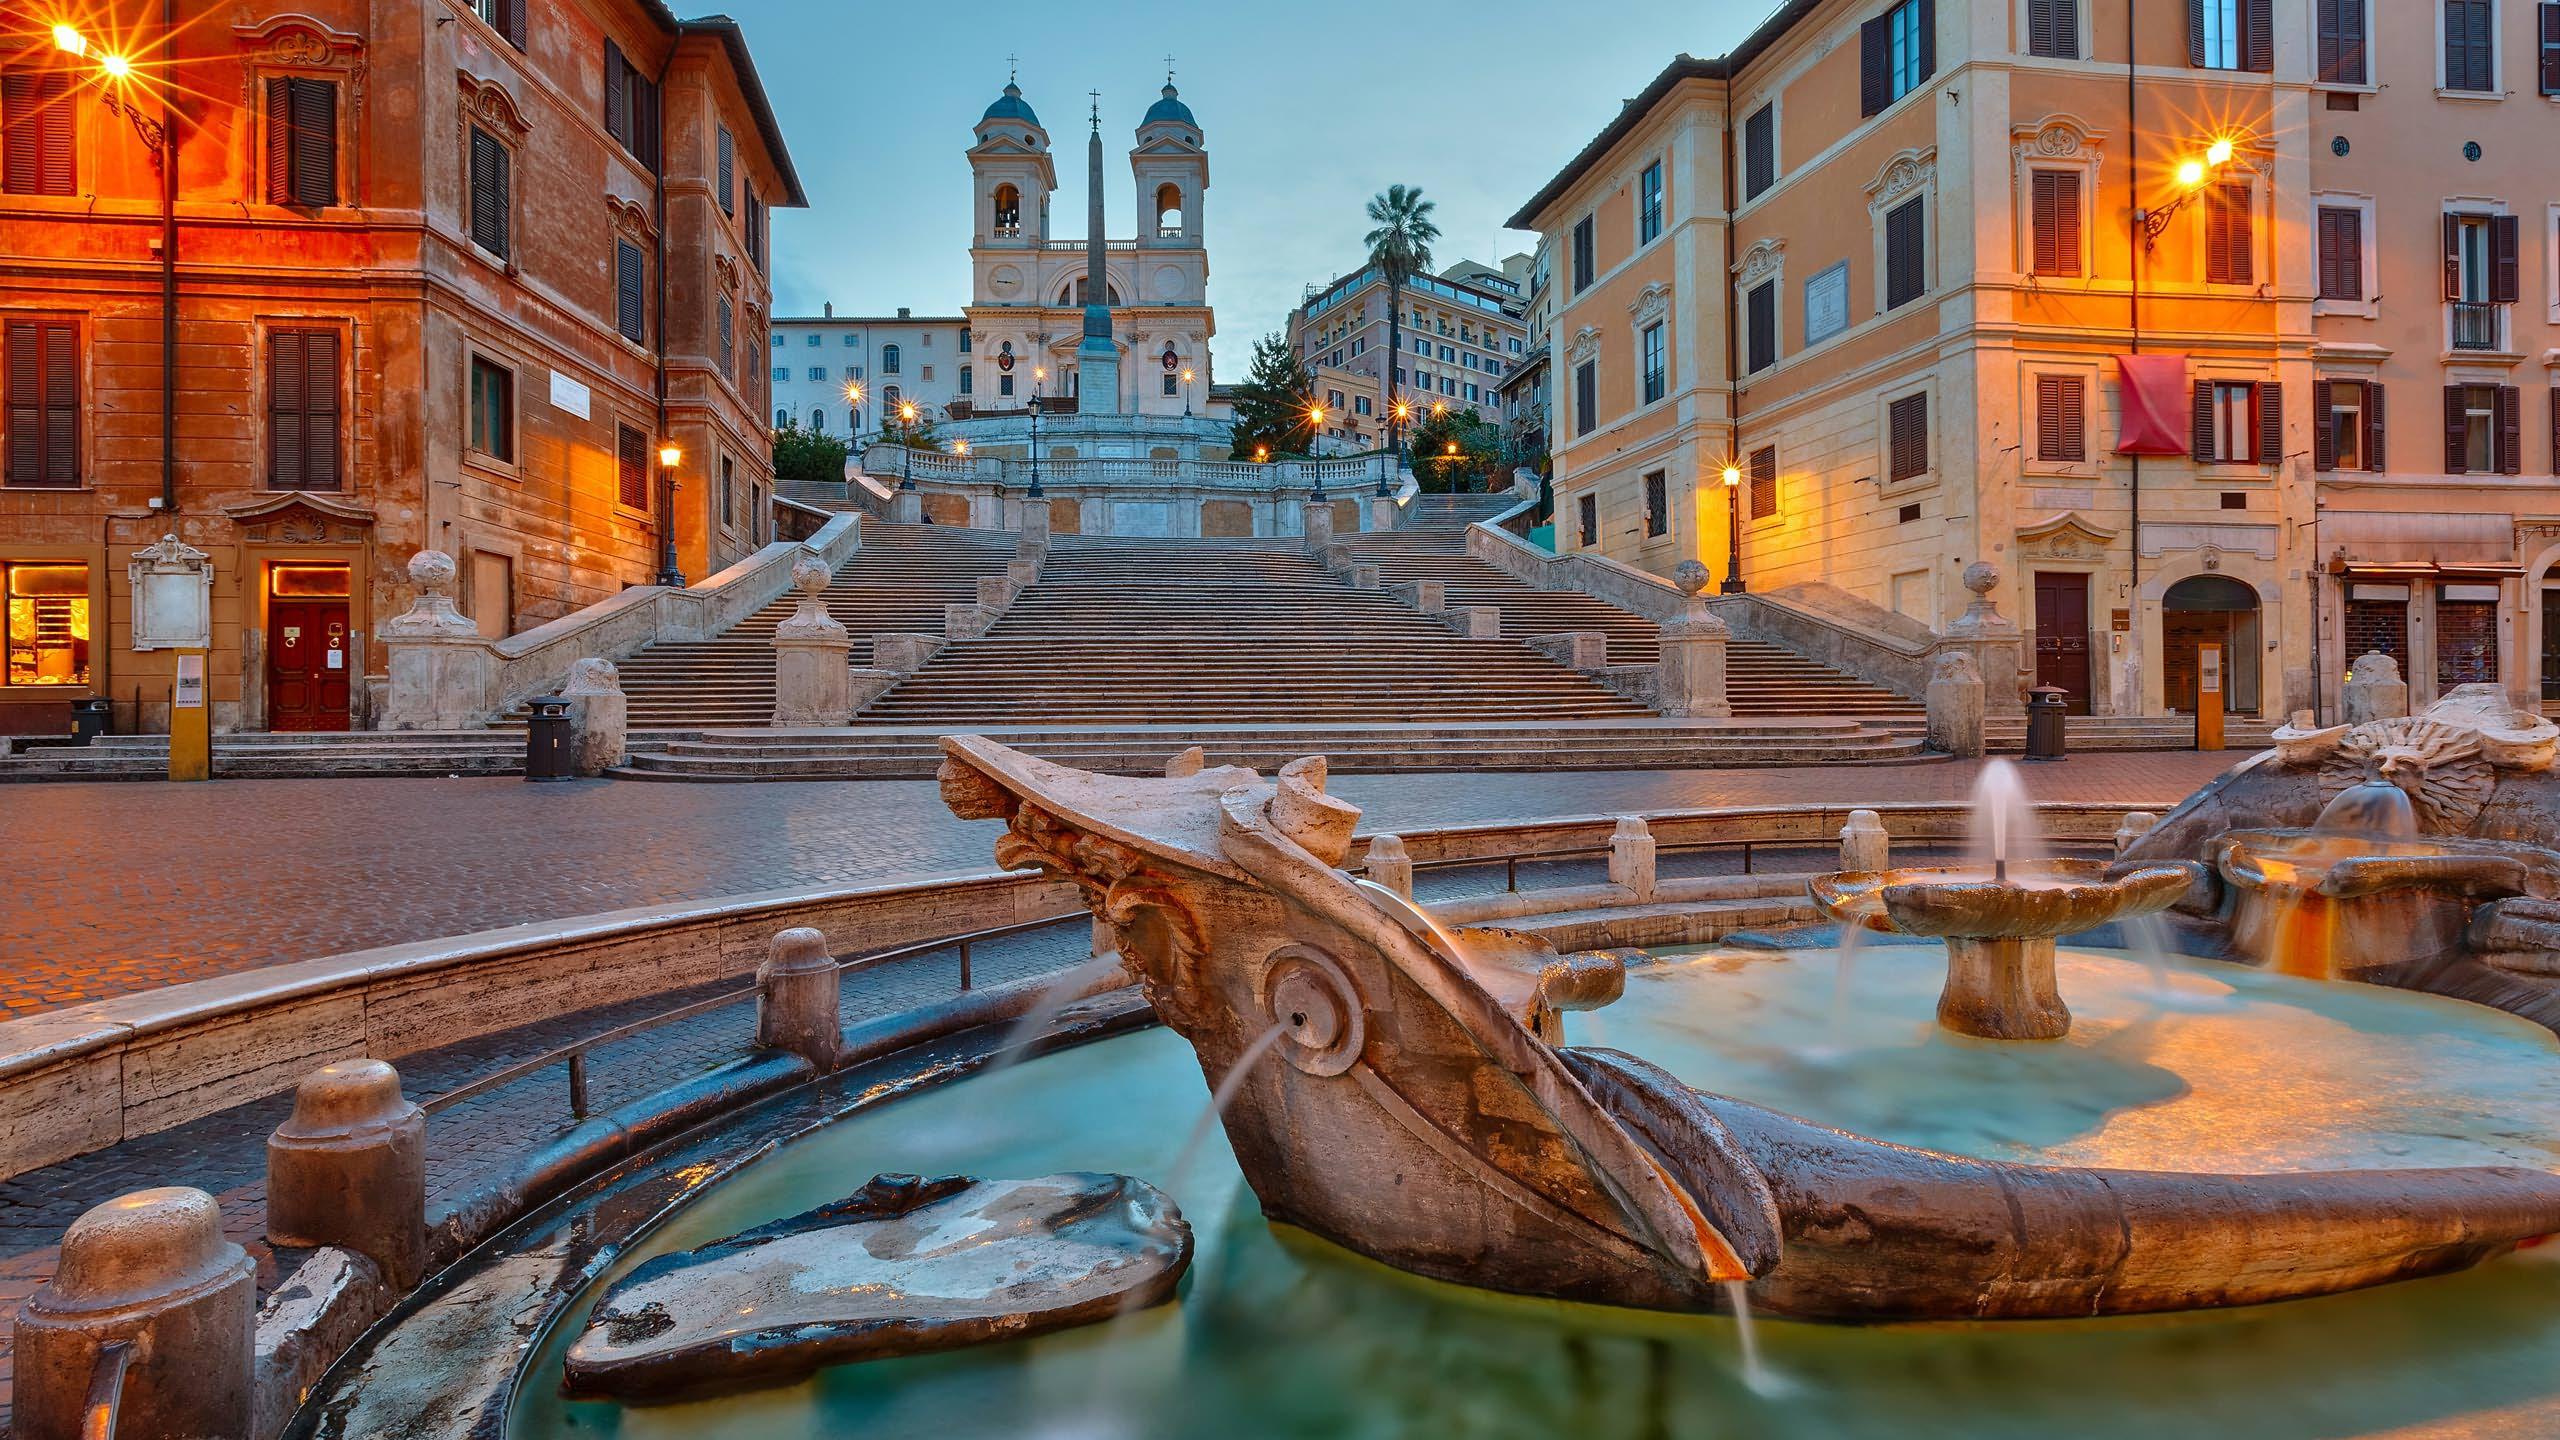 ludovisi-palace-roma-piazza-di-spagna.jpg